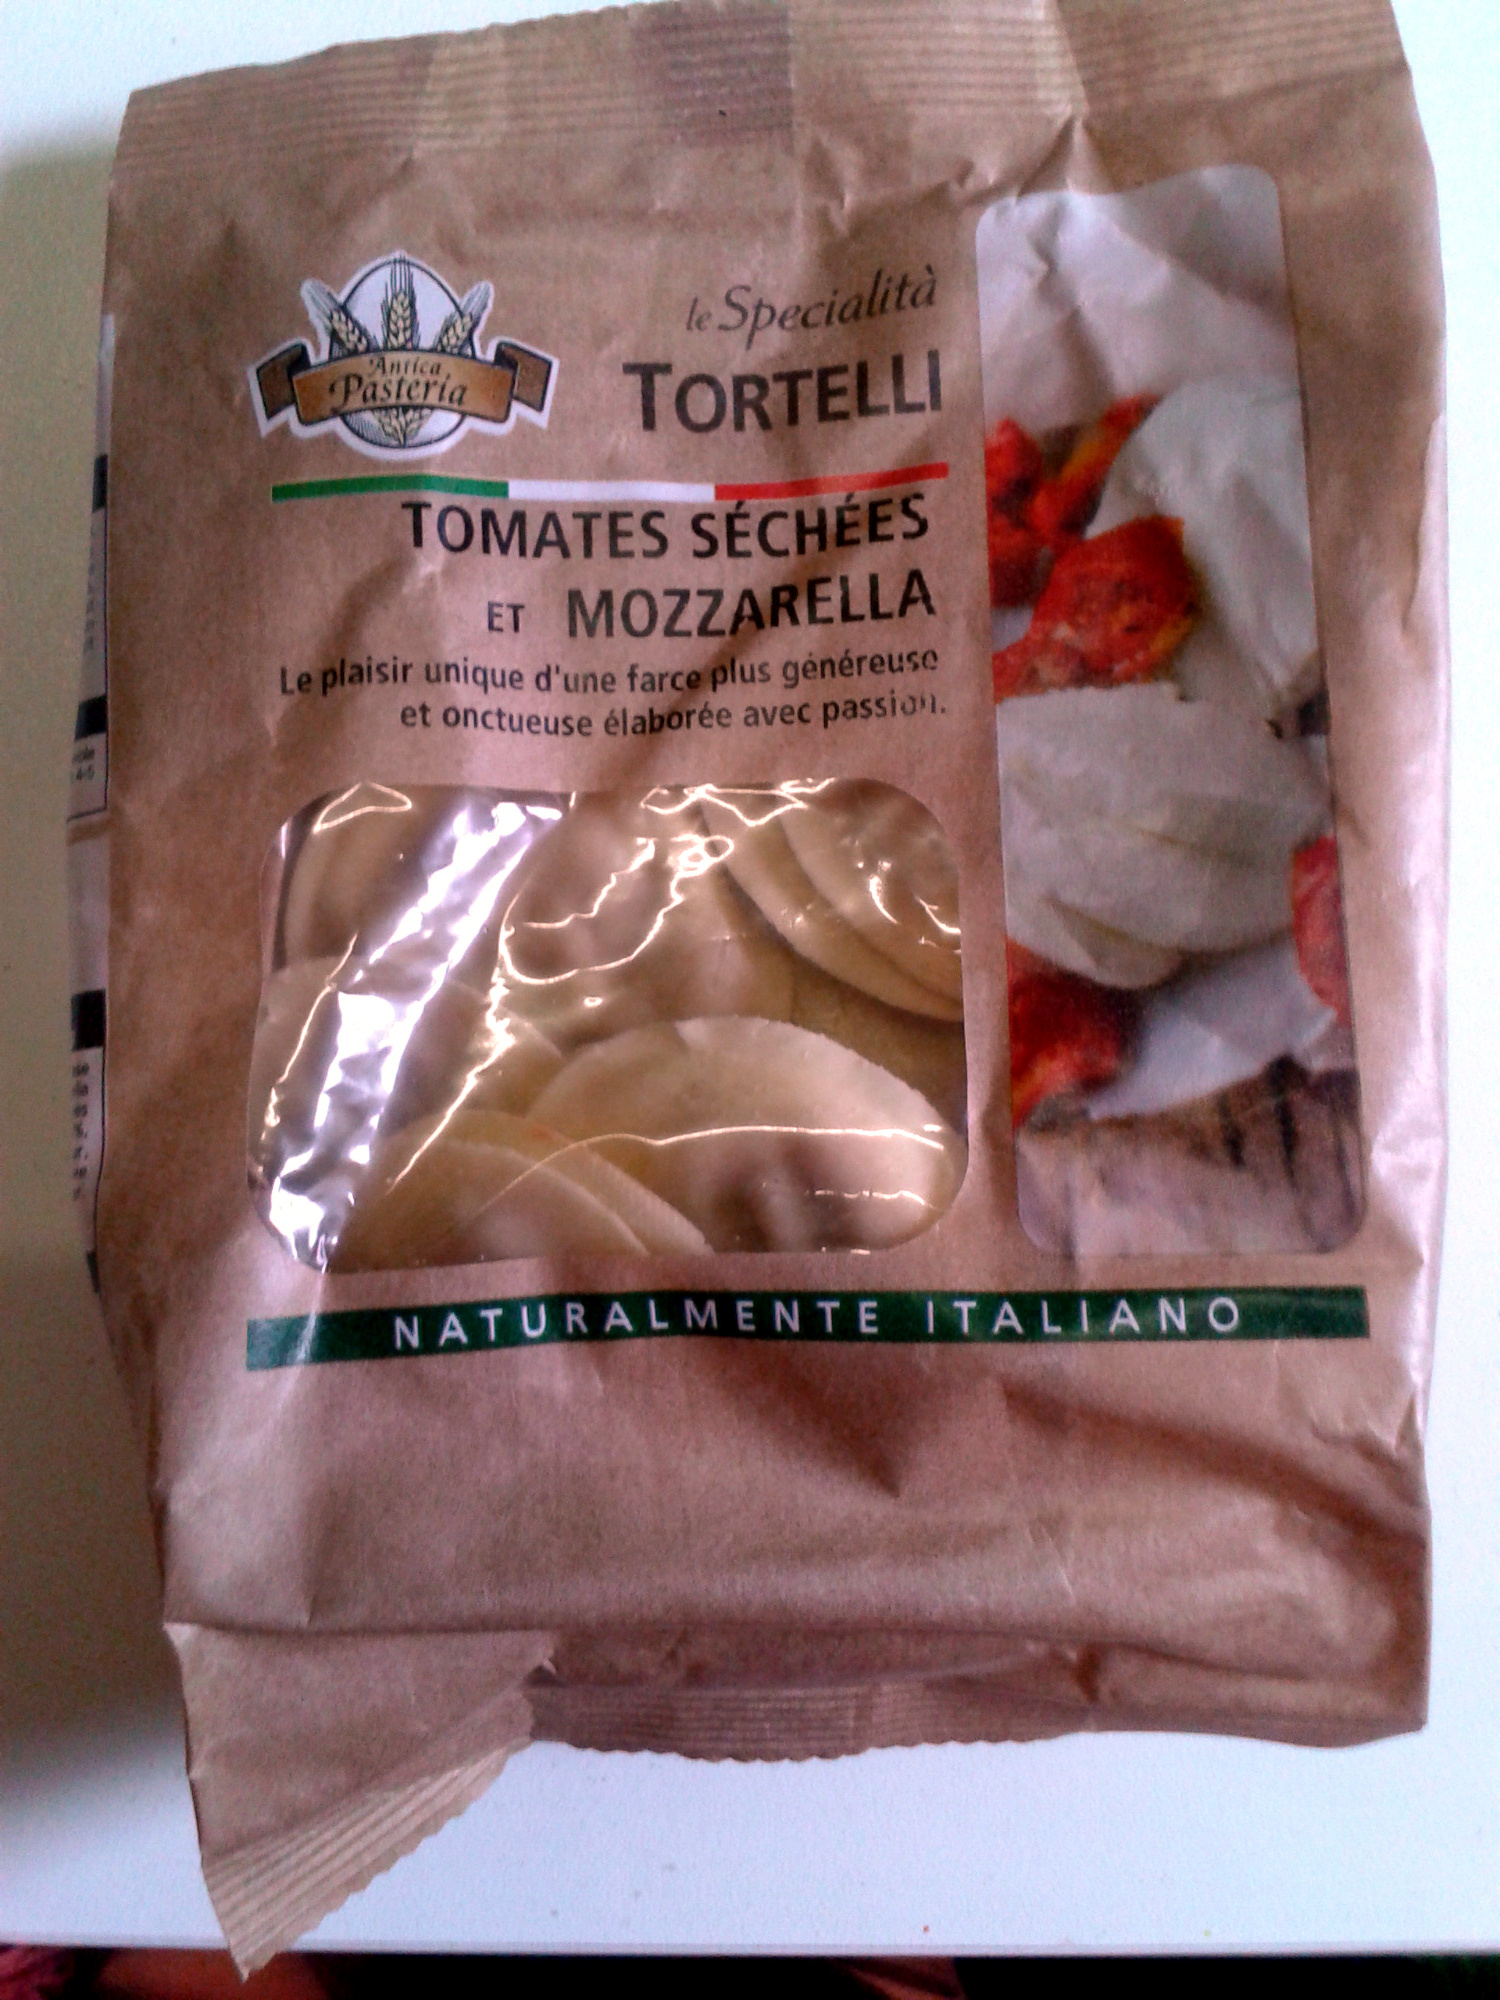 Tortelli tomates séchées et mozarella - Product - fr